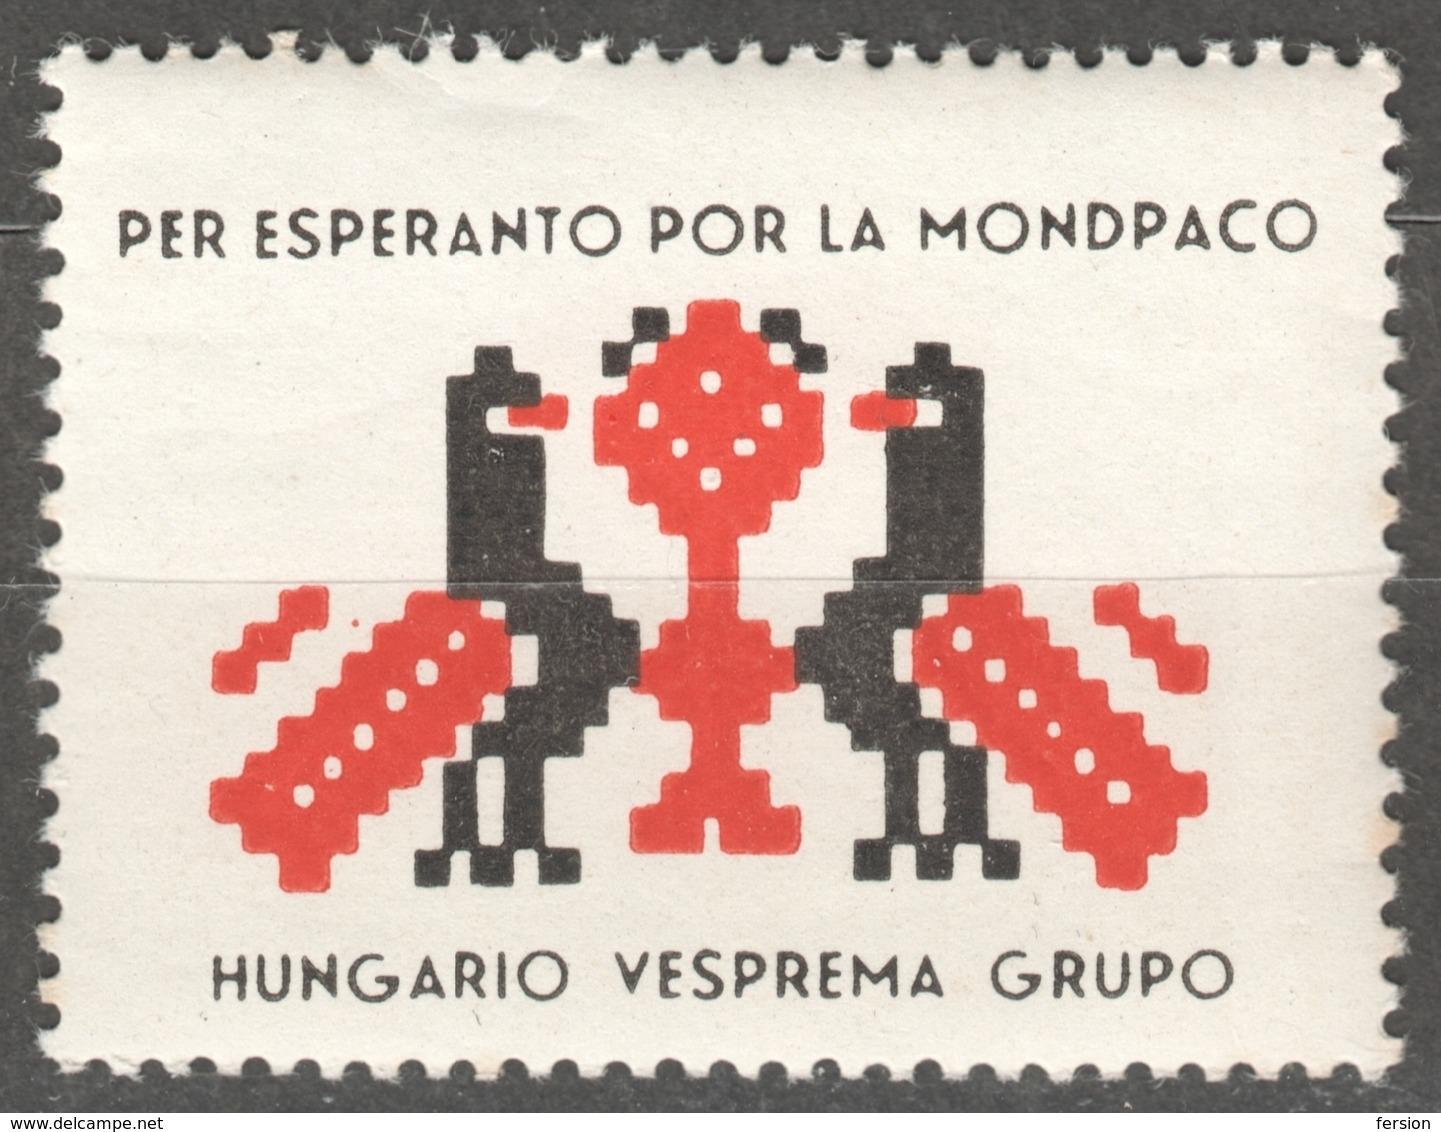 For WORLD PEACE - Folk Motif - Bird Dove Pigeon - ESPERANTO LABEL CINDERELLA VIGNETTE Hungary - VESZPRÉM - Esperanto